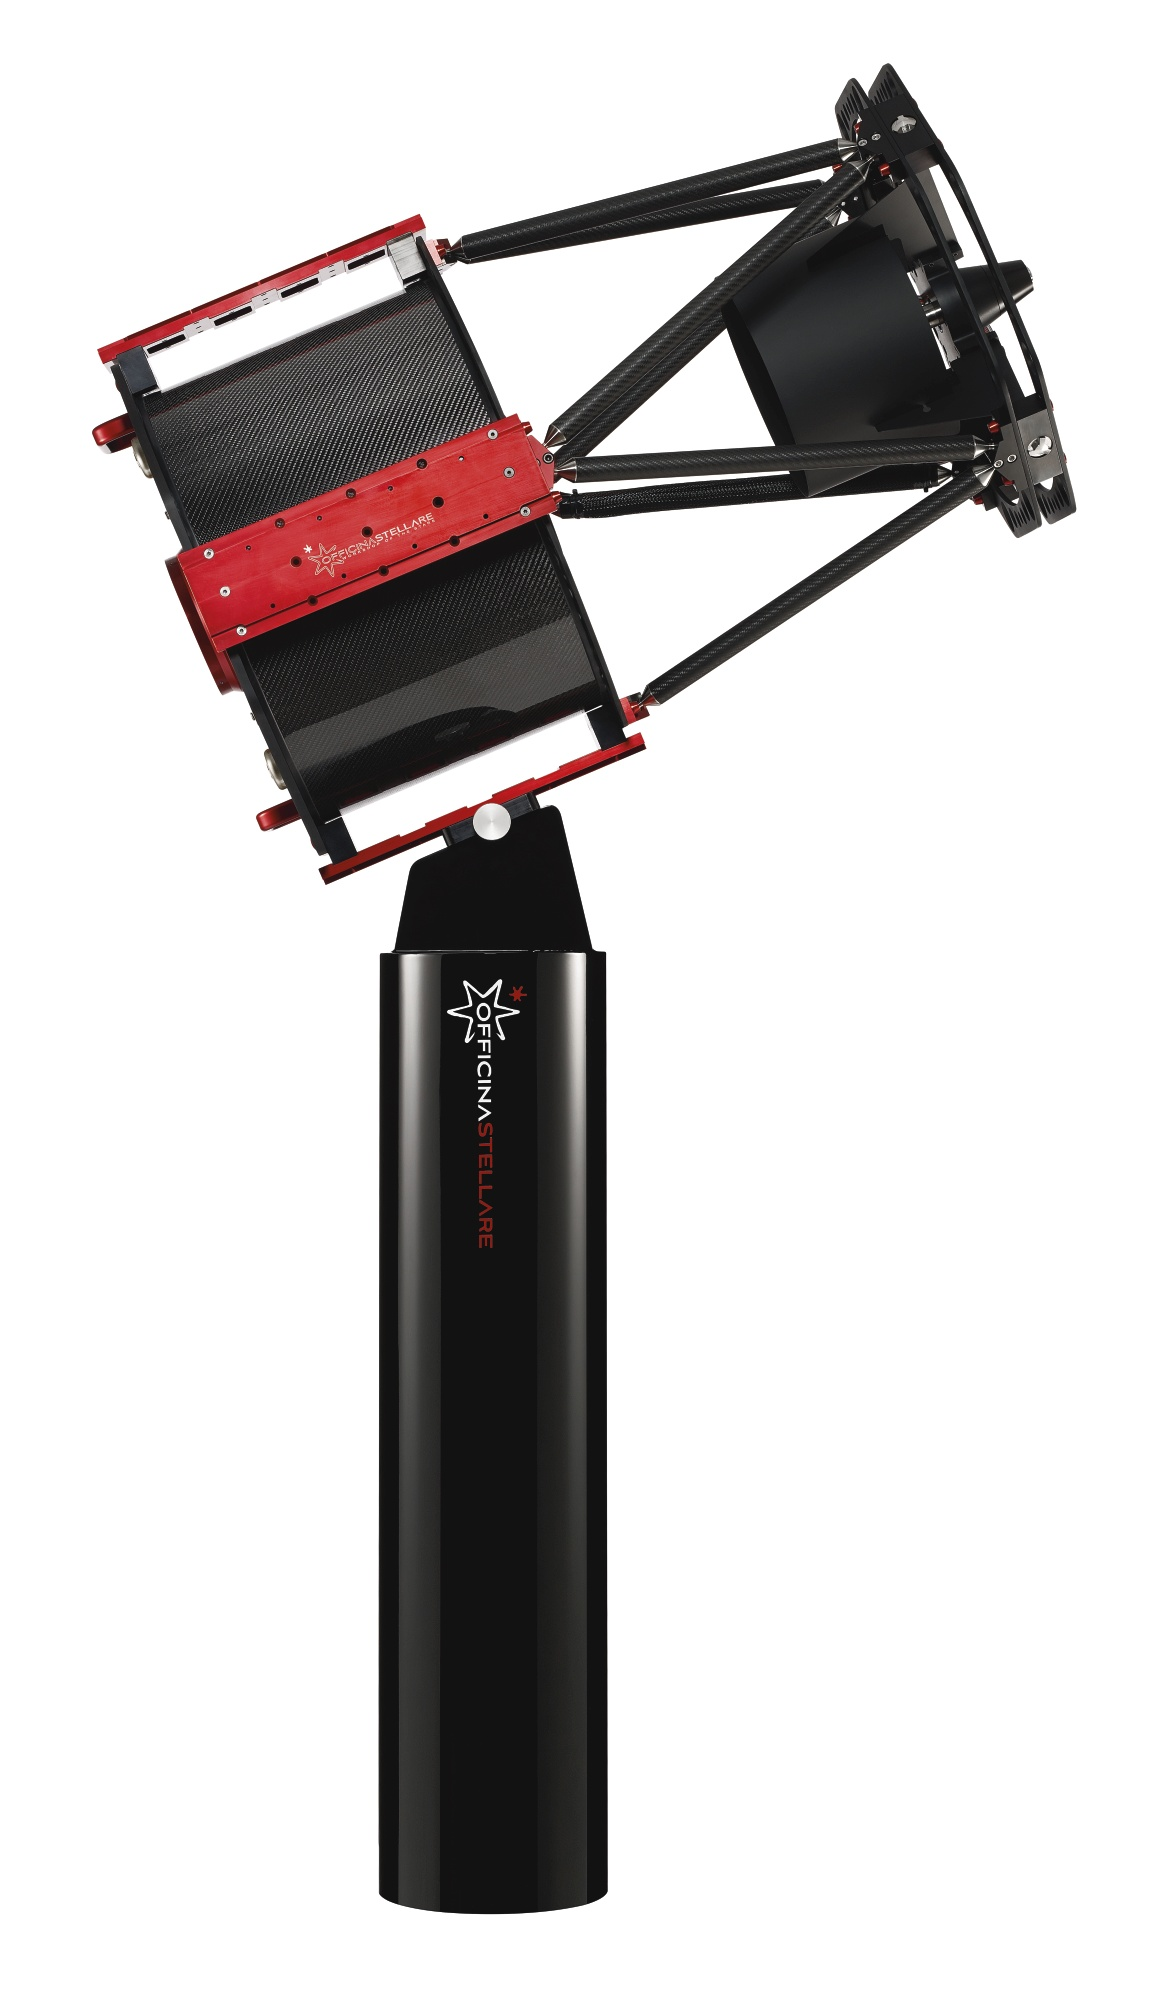 130806RD_telescope_040_key